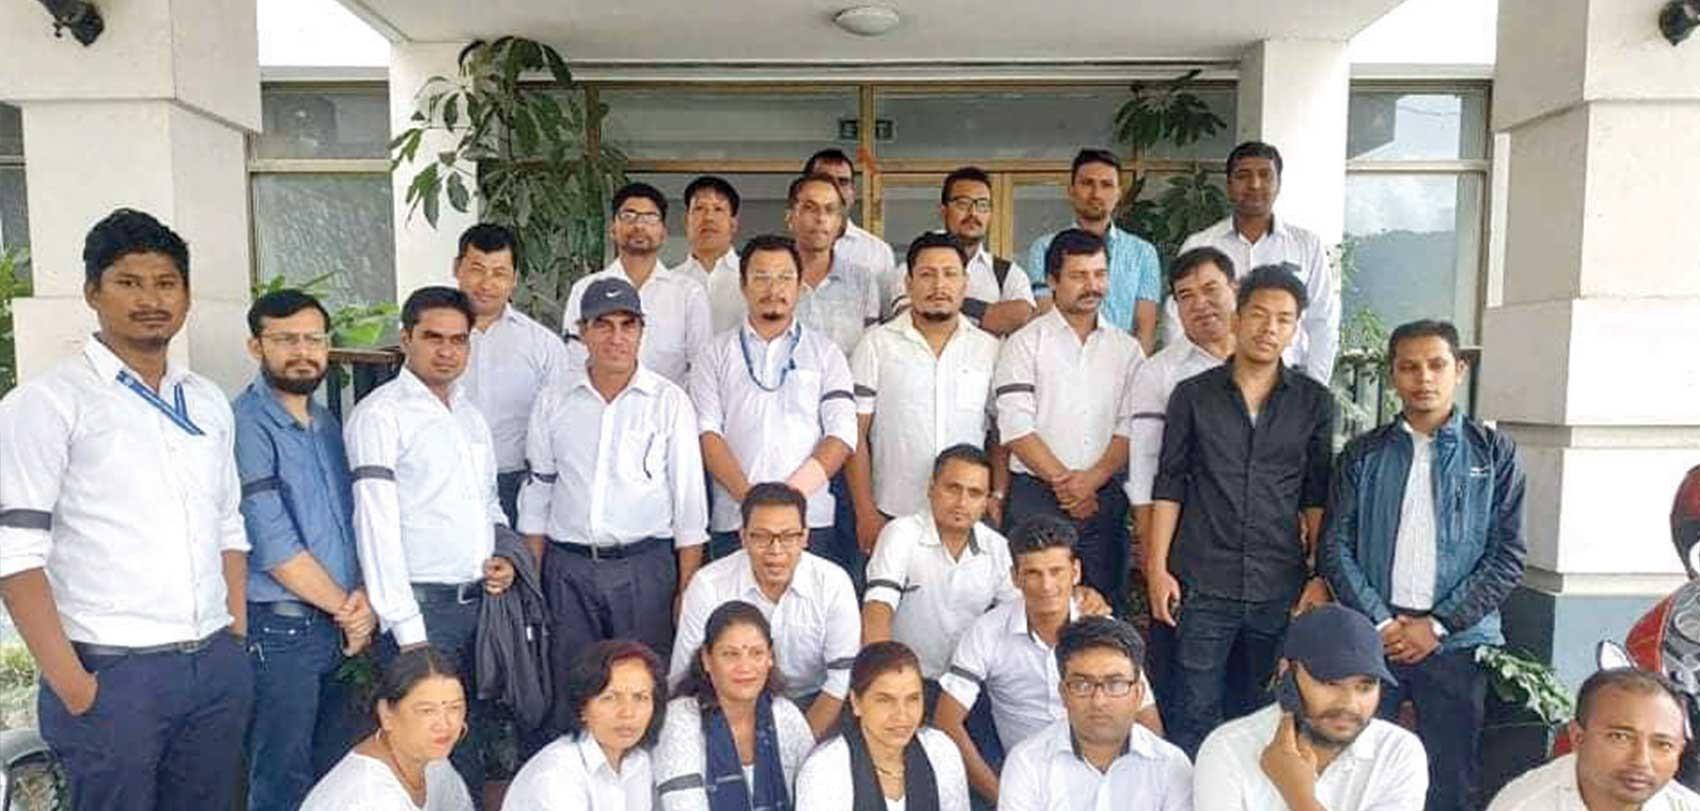 बनेपा  पोलिटेक्निकका कर्मचारीको आन्दोलन जारी